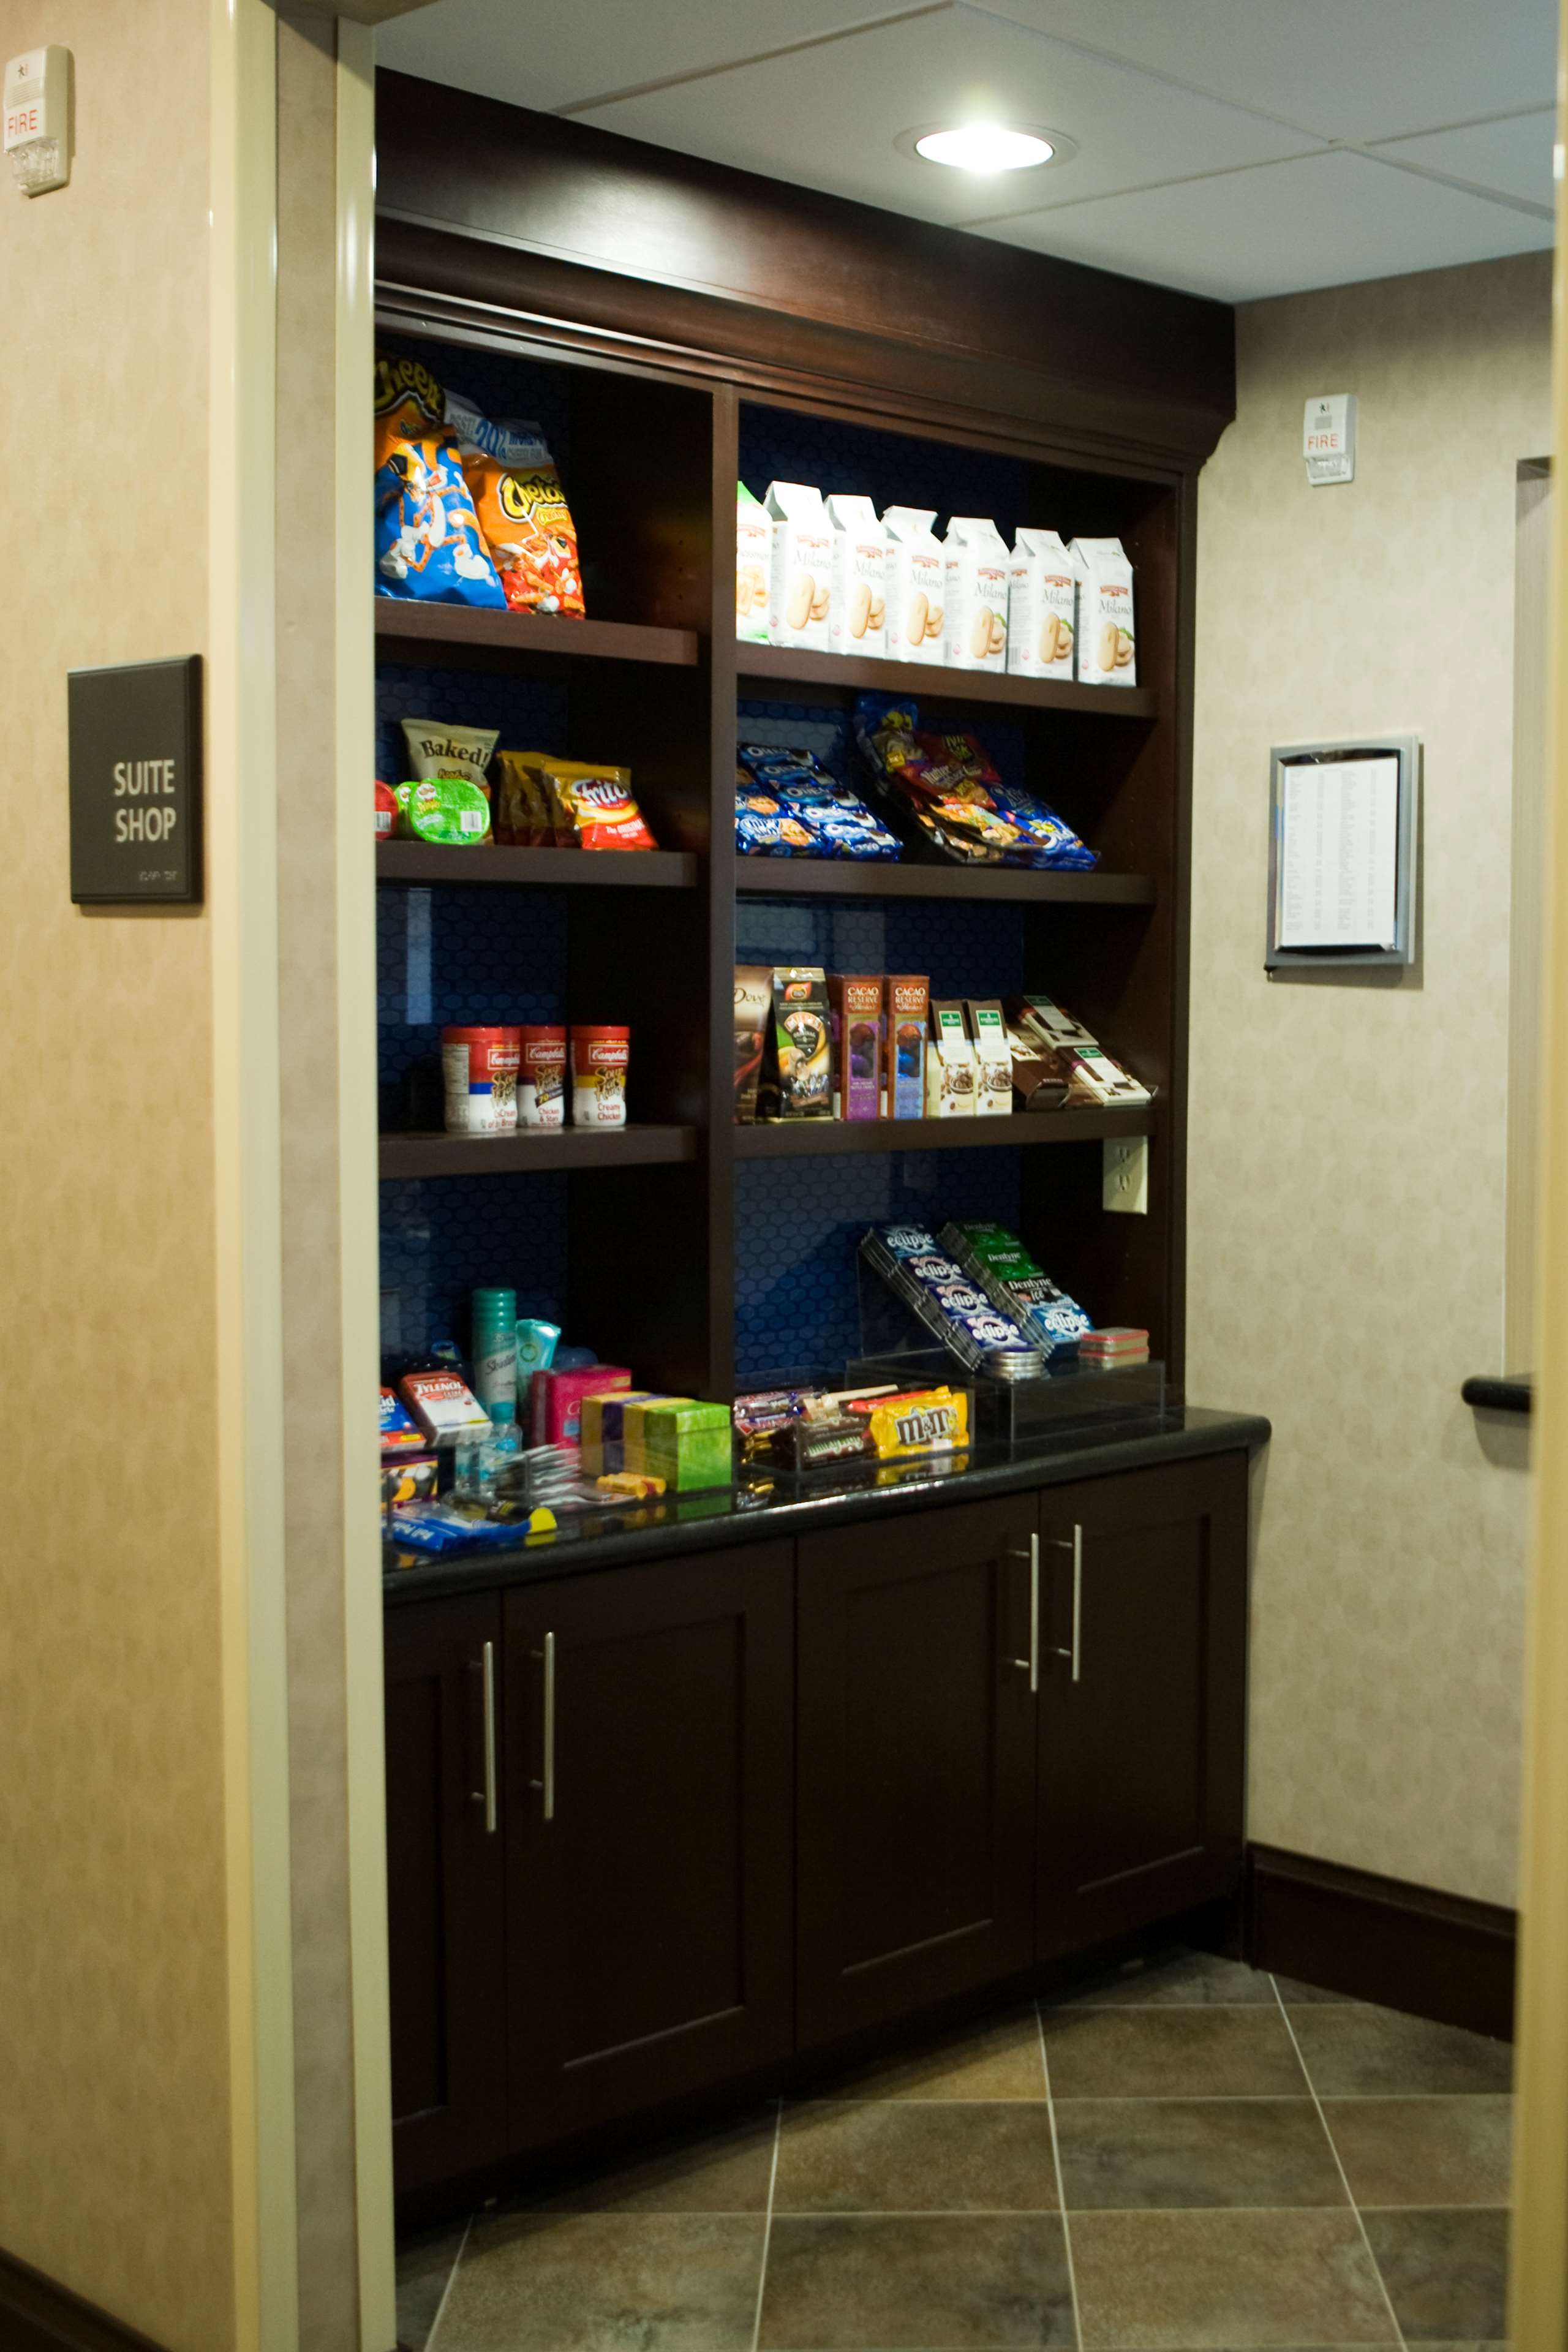 Hampton Inn & Suites Mount Pleasant image 15